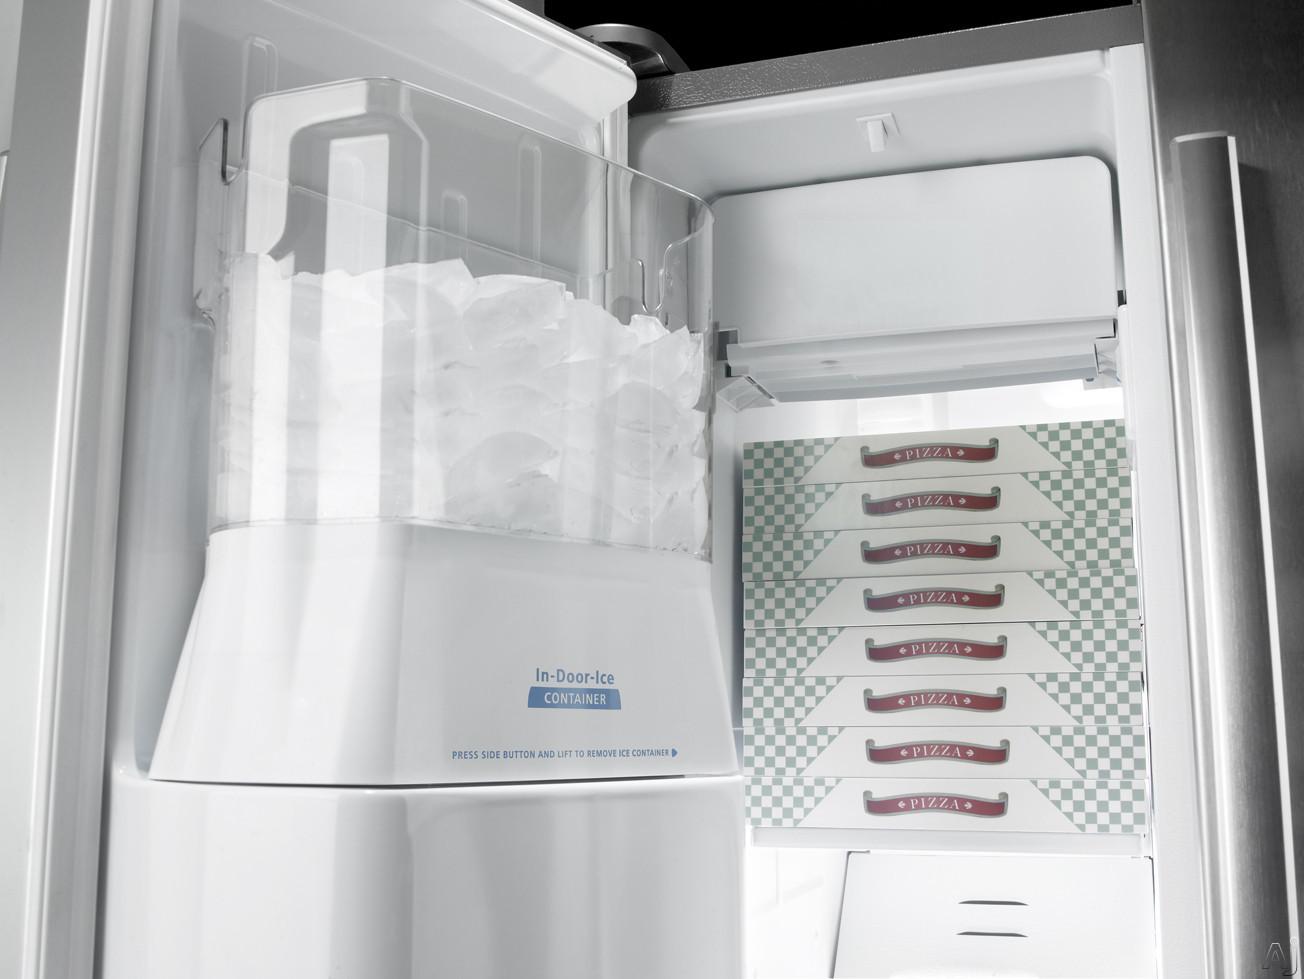 Whirlpool Gs6nhaxvs 25 6 Cu Ft Side By Side Refrigerator